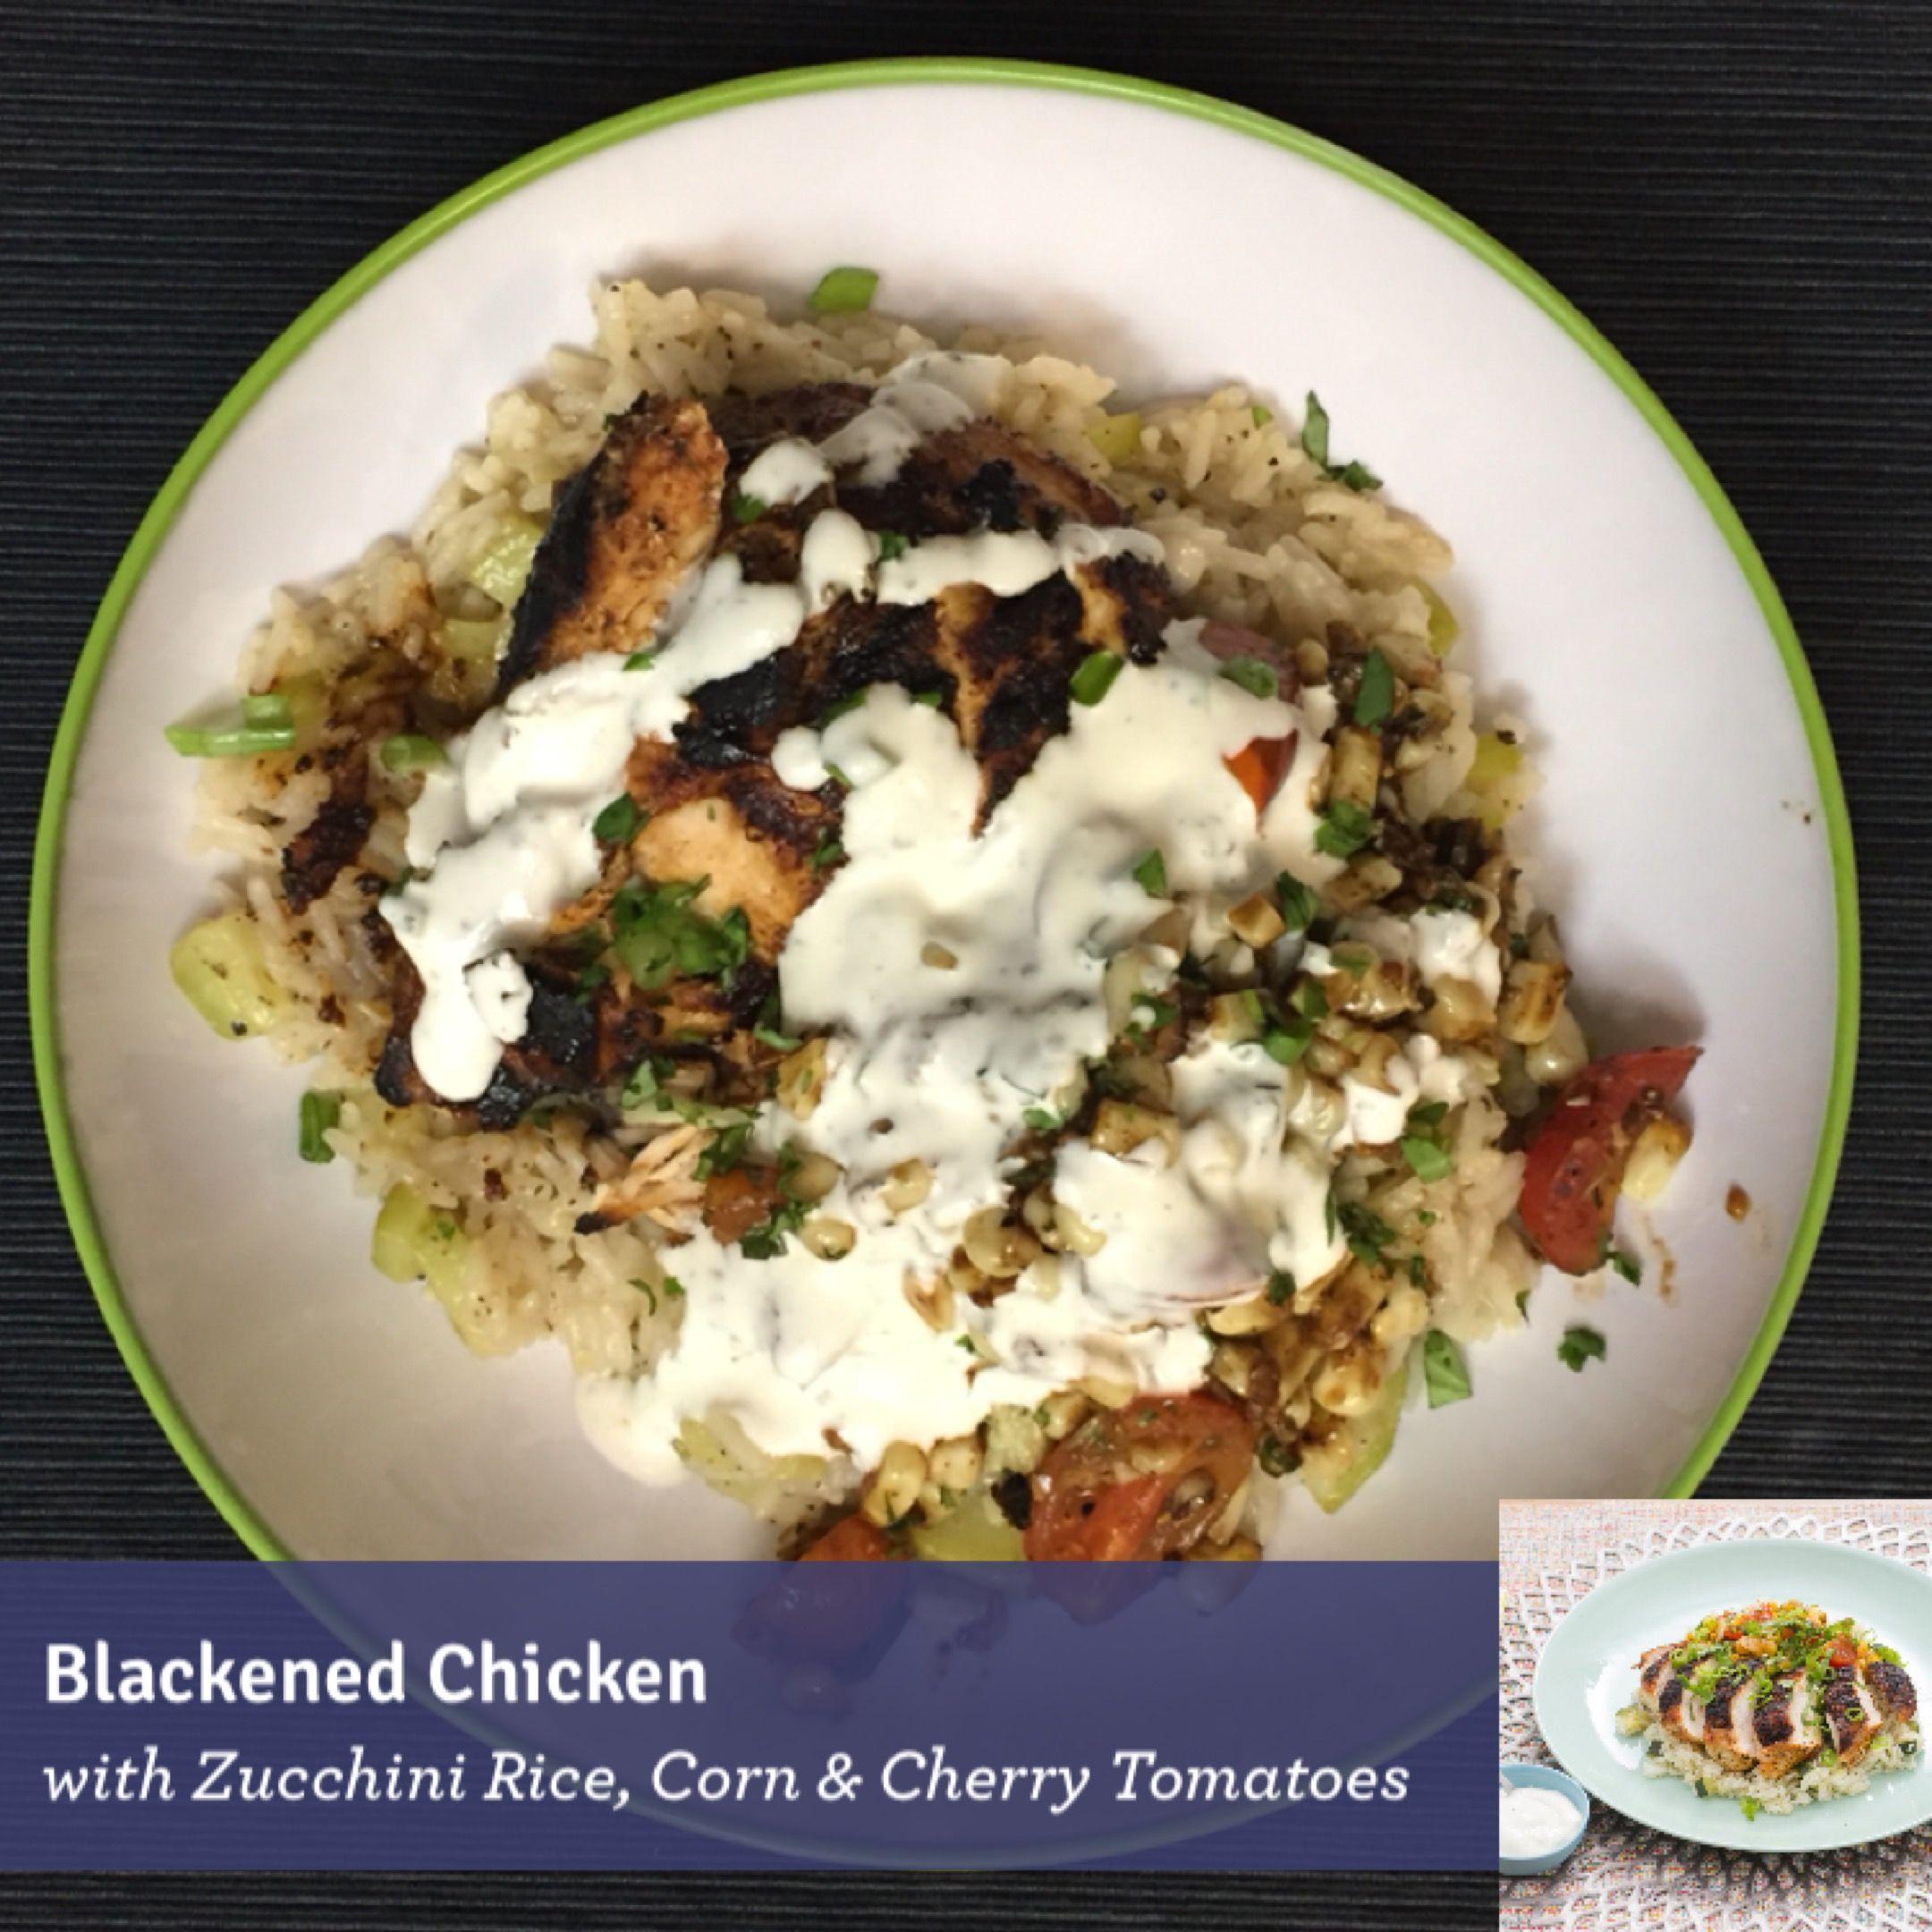 Blue apron zucchini rice - Blackened Chicken With Zucchini Rice Corn Cherry Tomatoes Blueapron